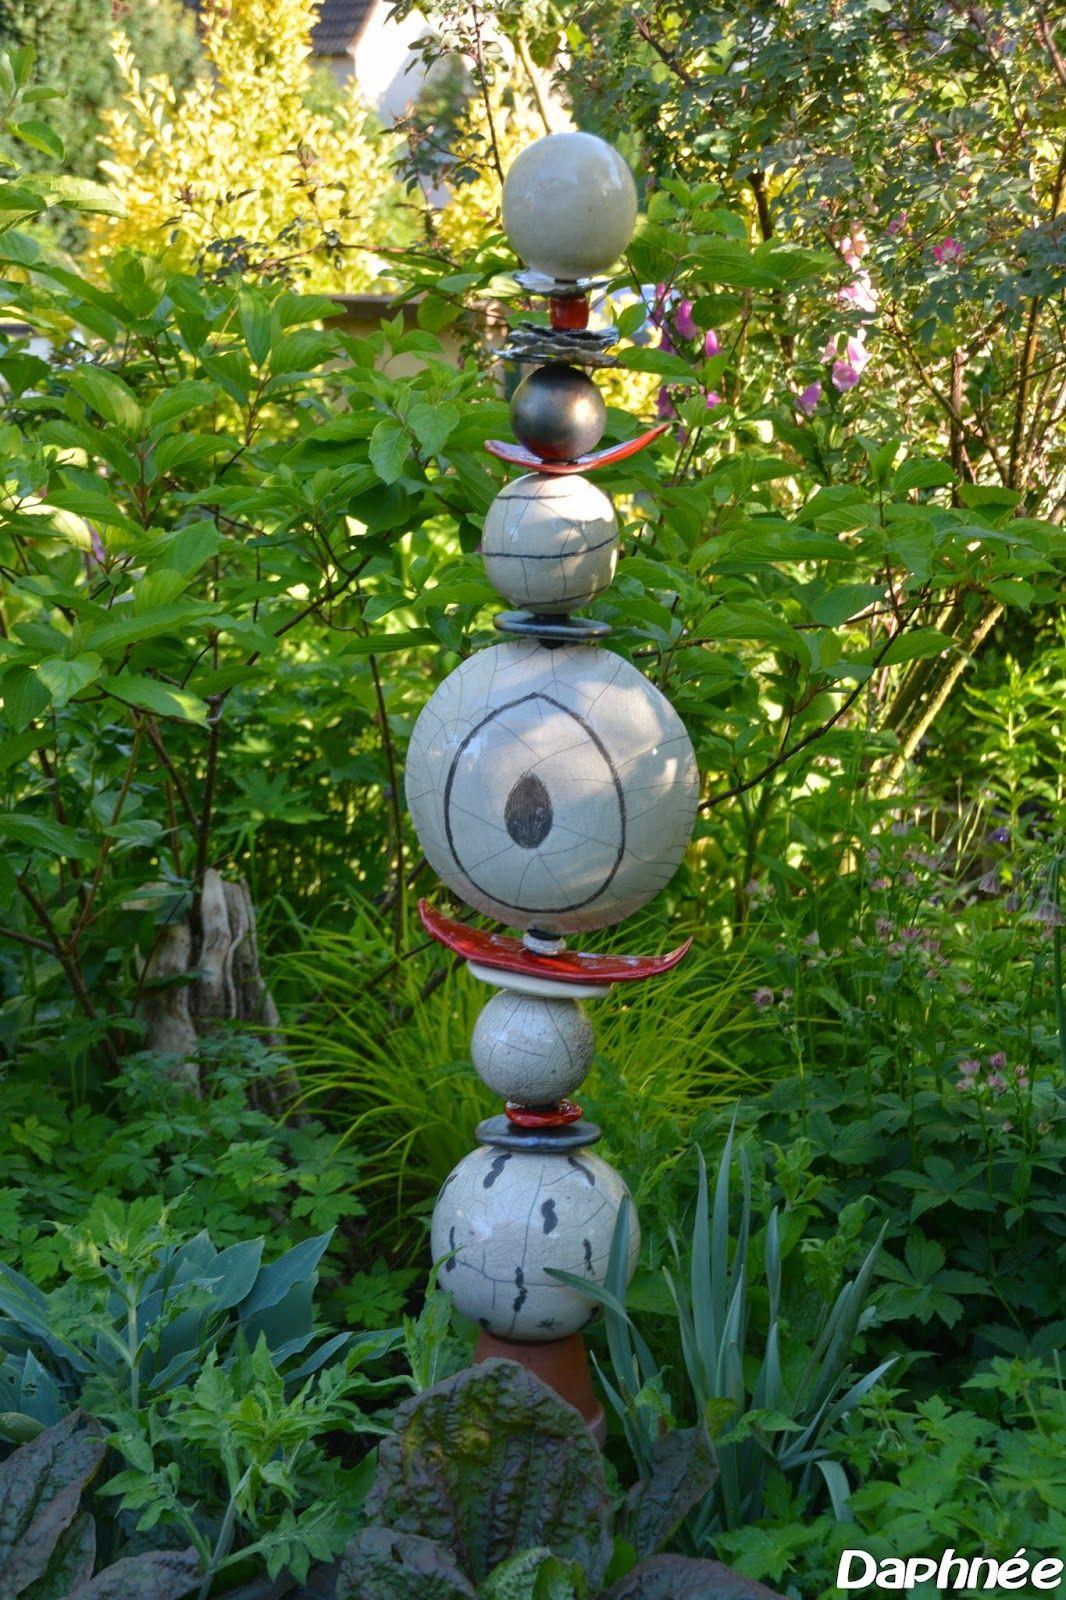 Related Image | Totem | Poterie Jardin, Poterie Y Poterie ... tout Boule Céramique Jardin